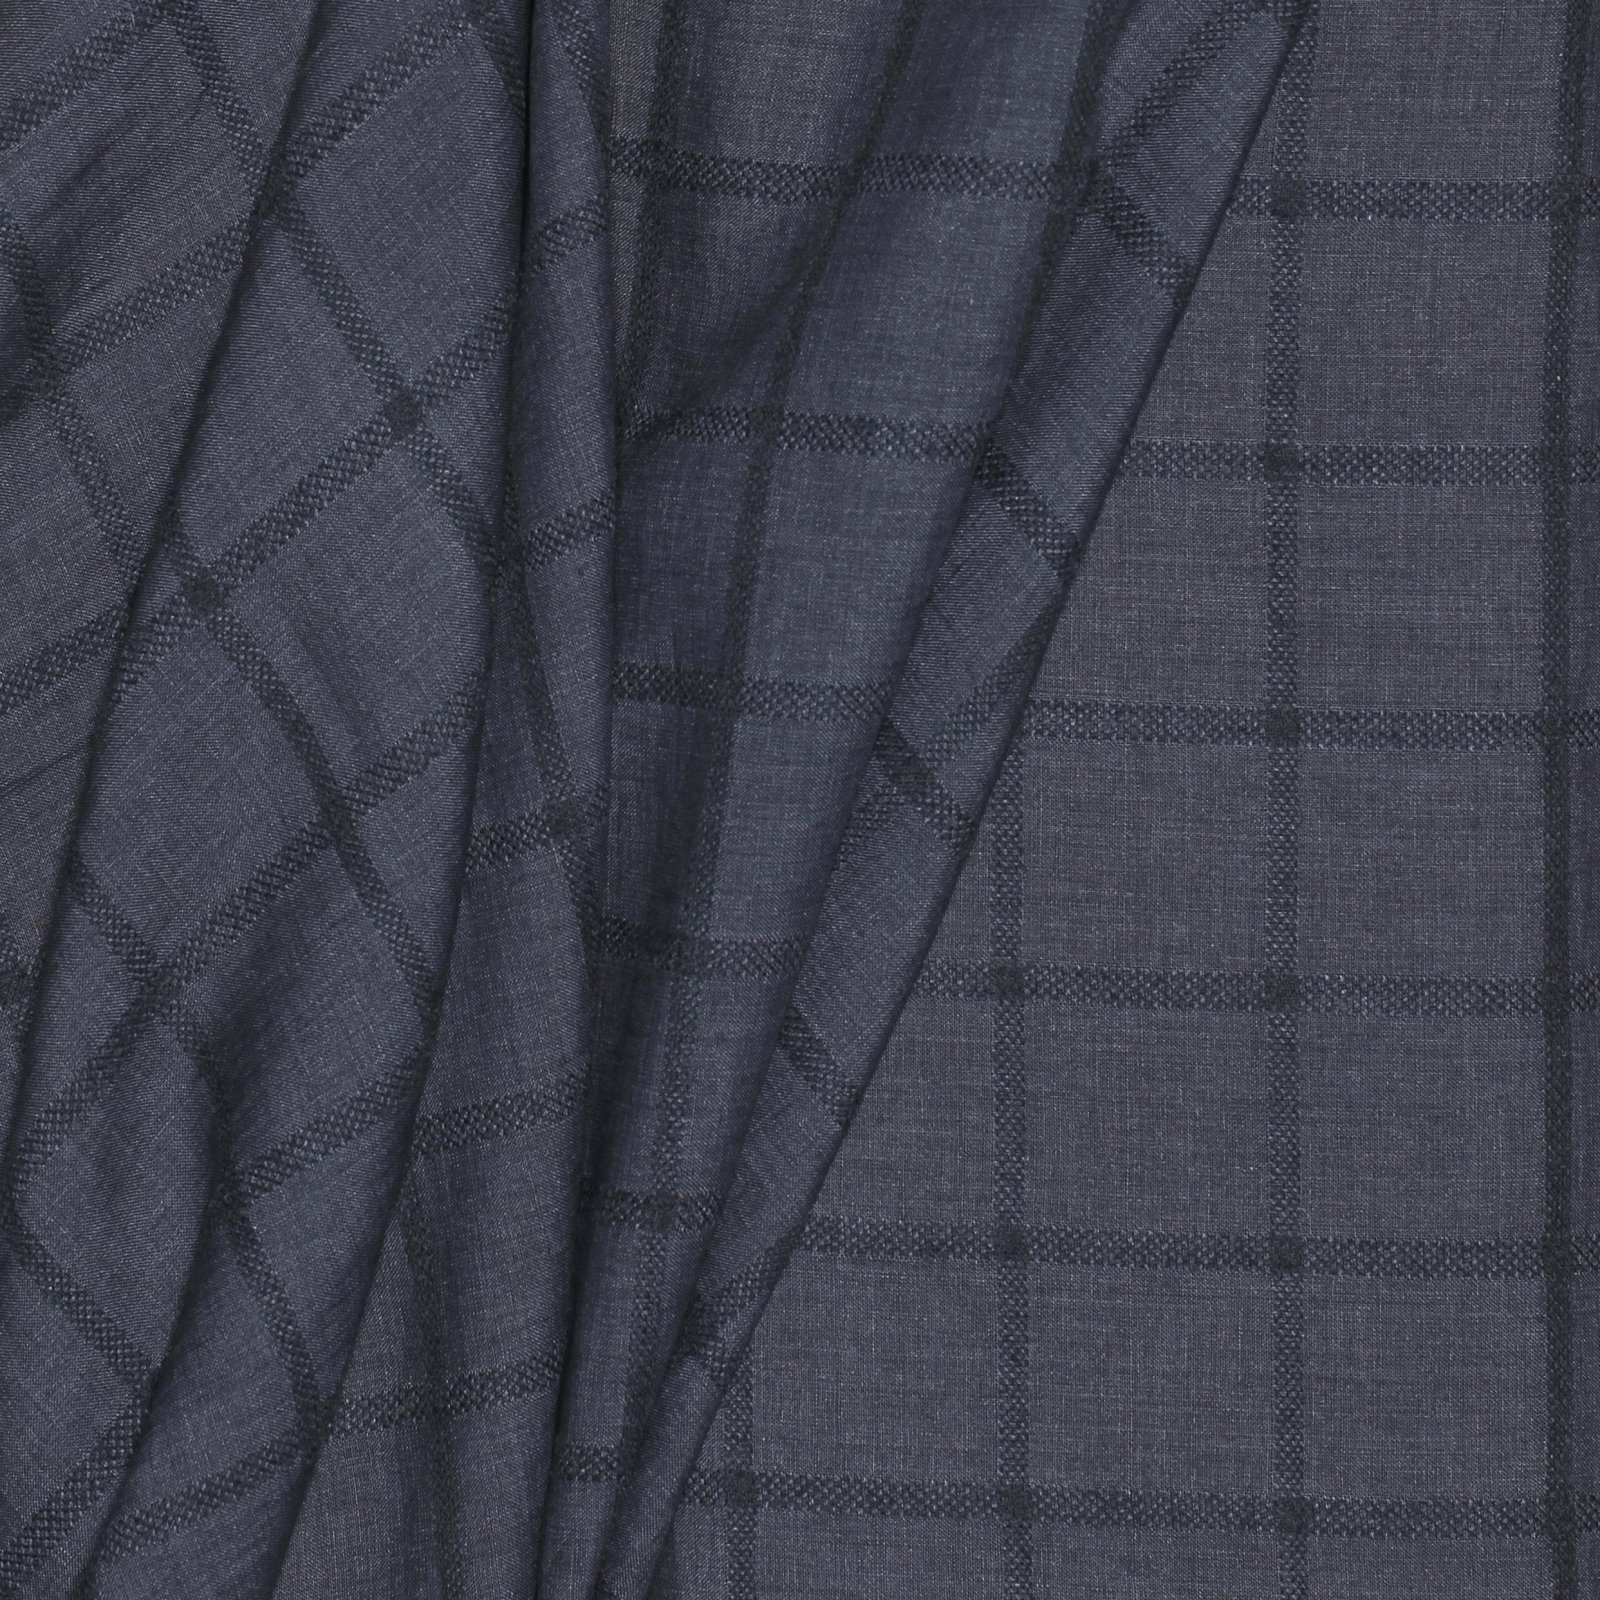 Charcoal Grey w/Jaquard Plaid Italian Linen